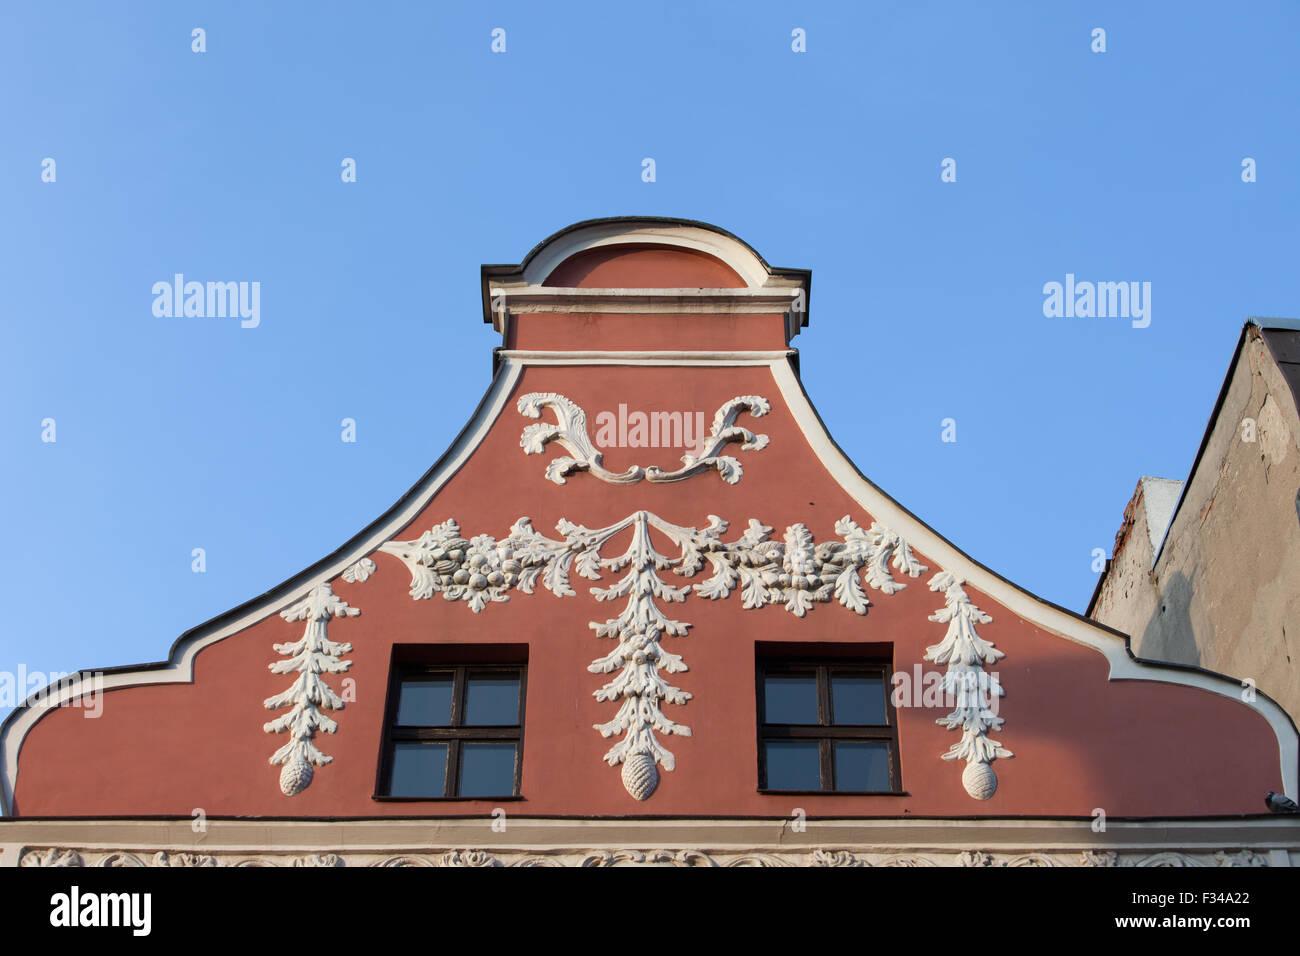 Historic house gable in Torun, Poland. - Stock Image